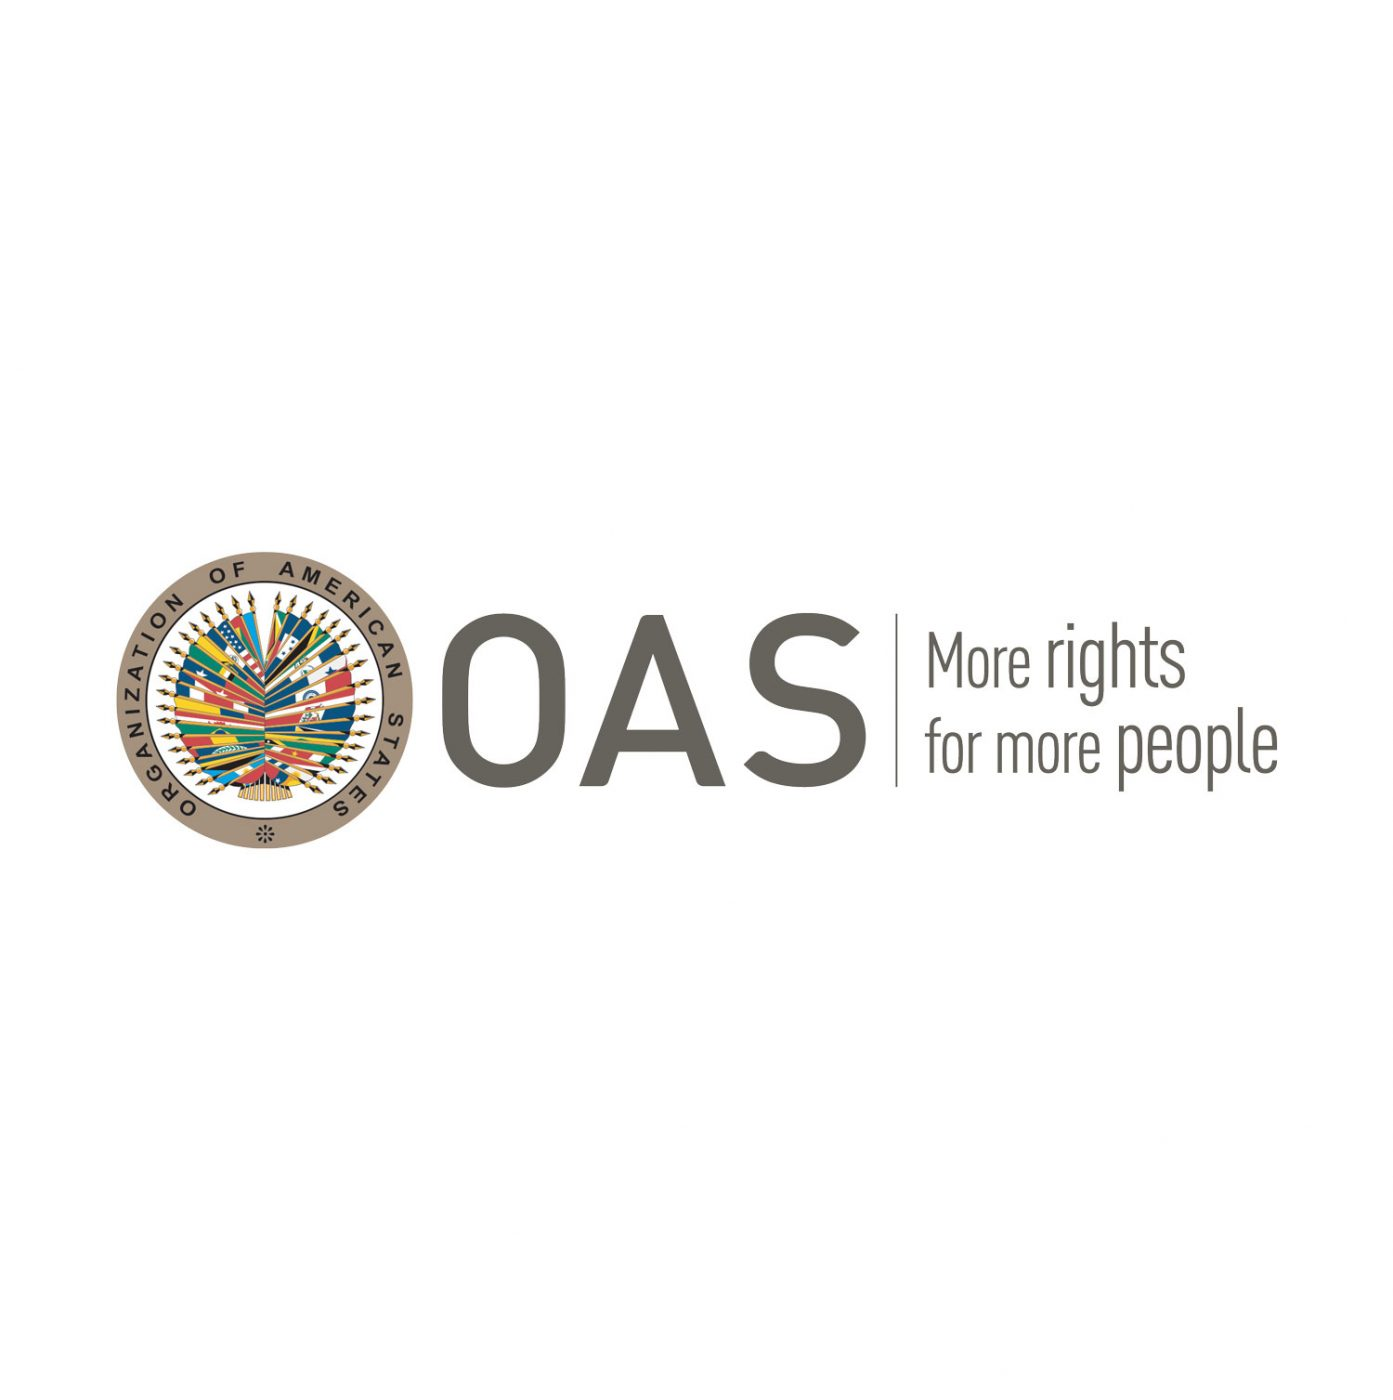 oas sq 1393x1400 - Organization of American States